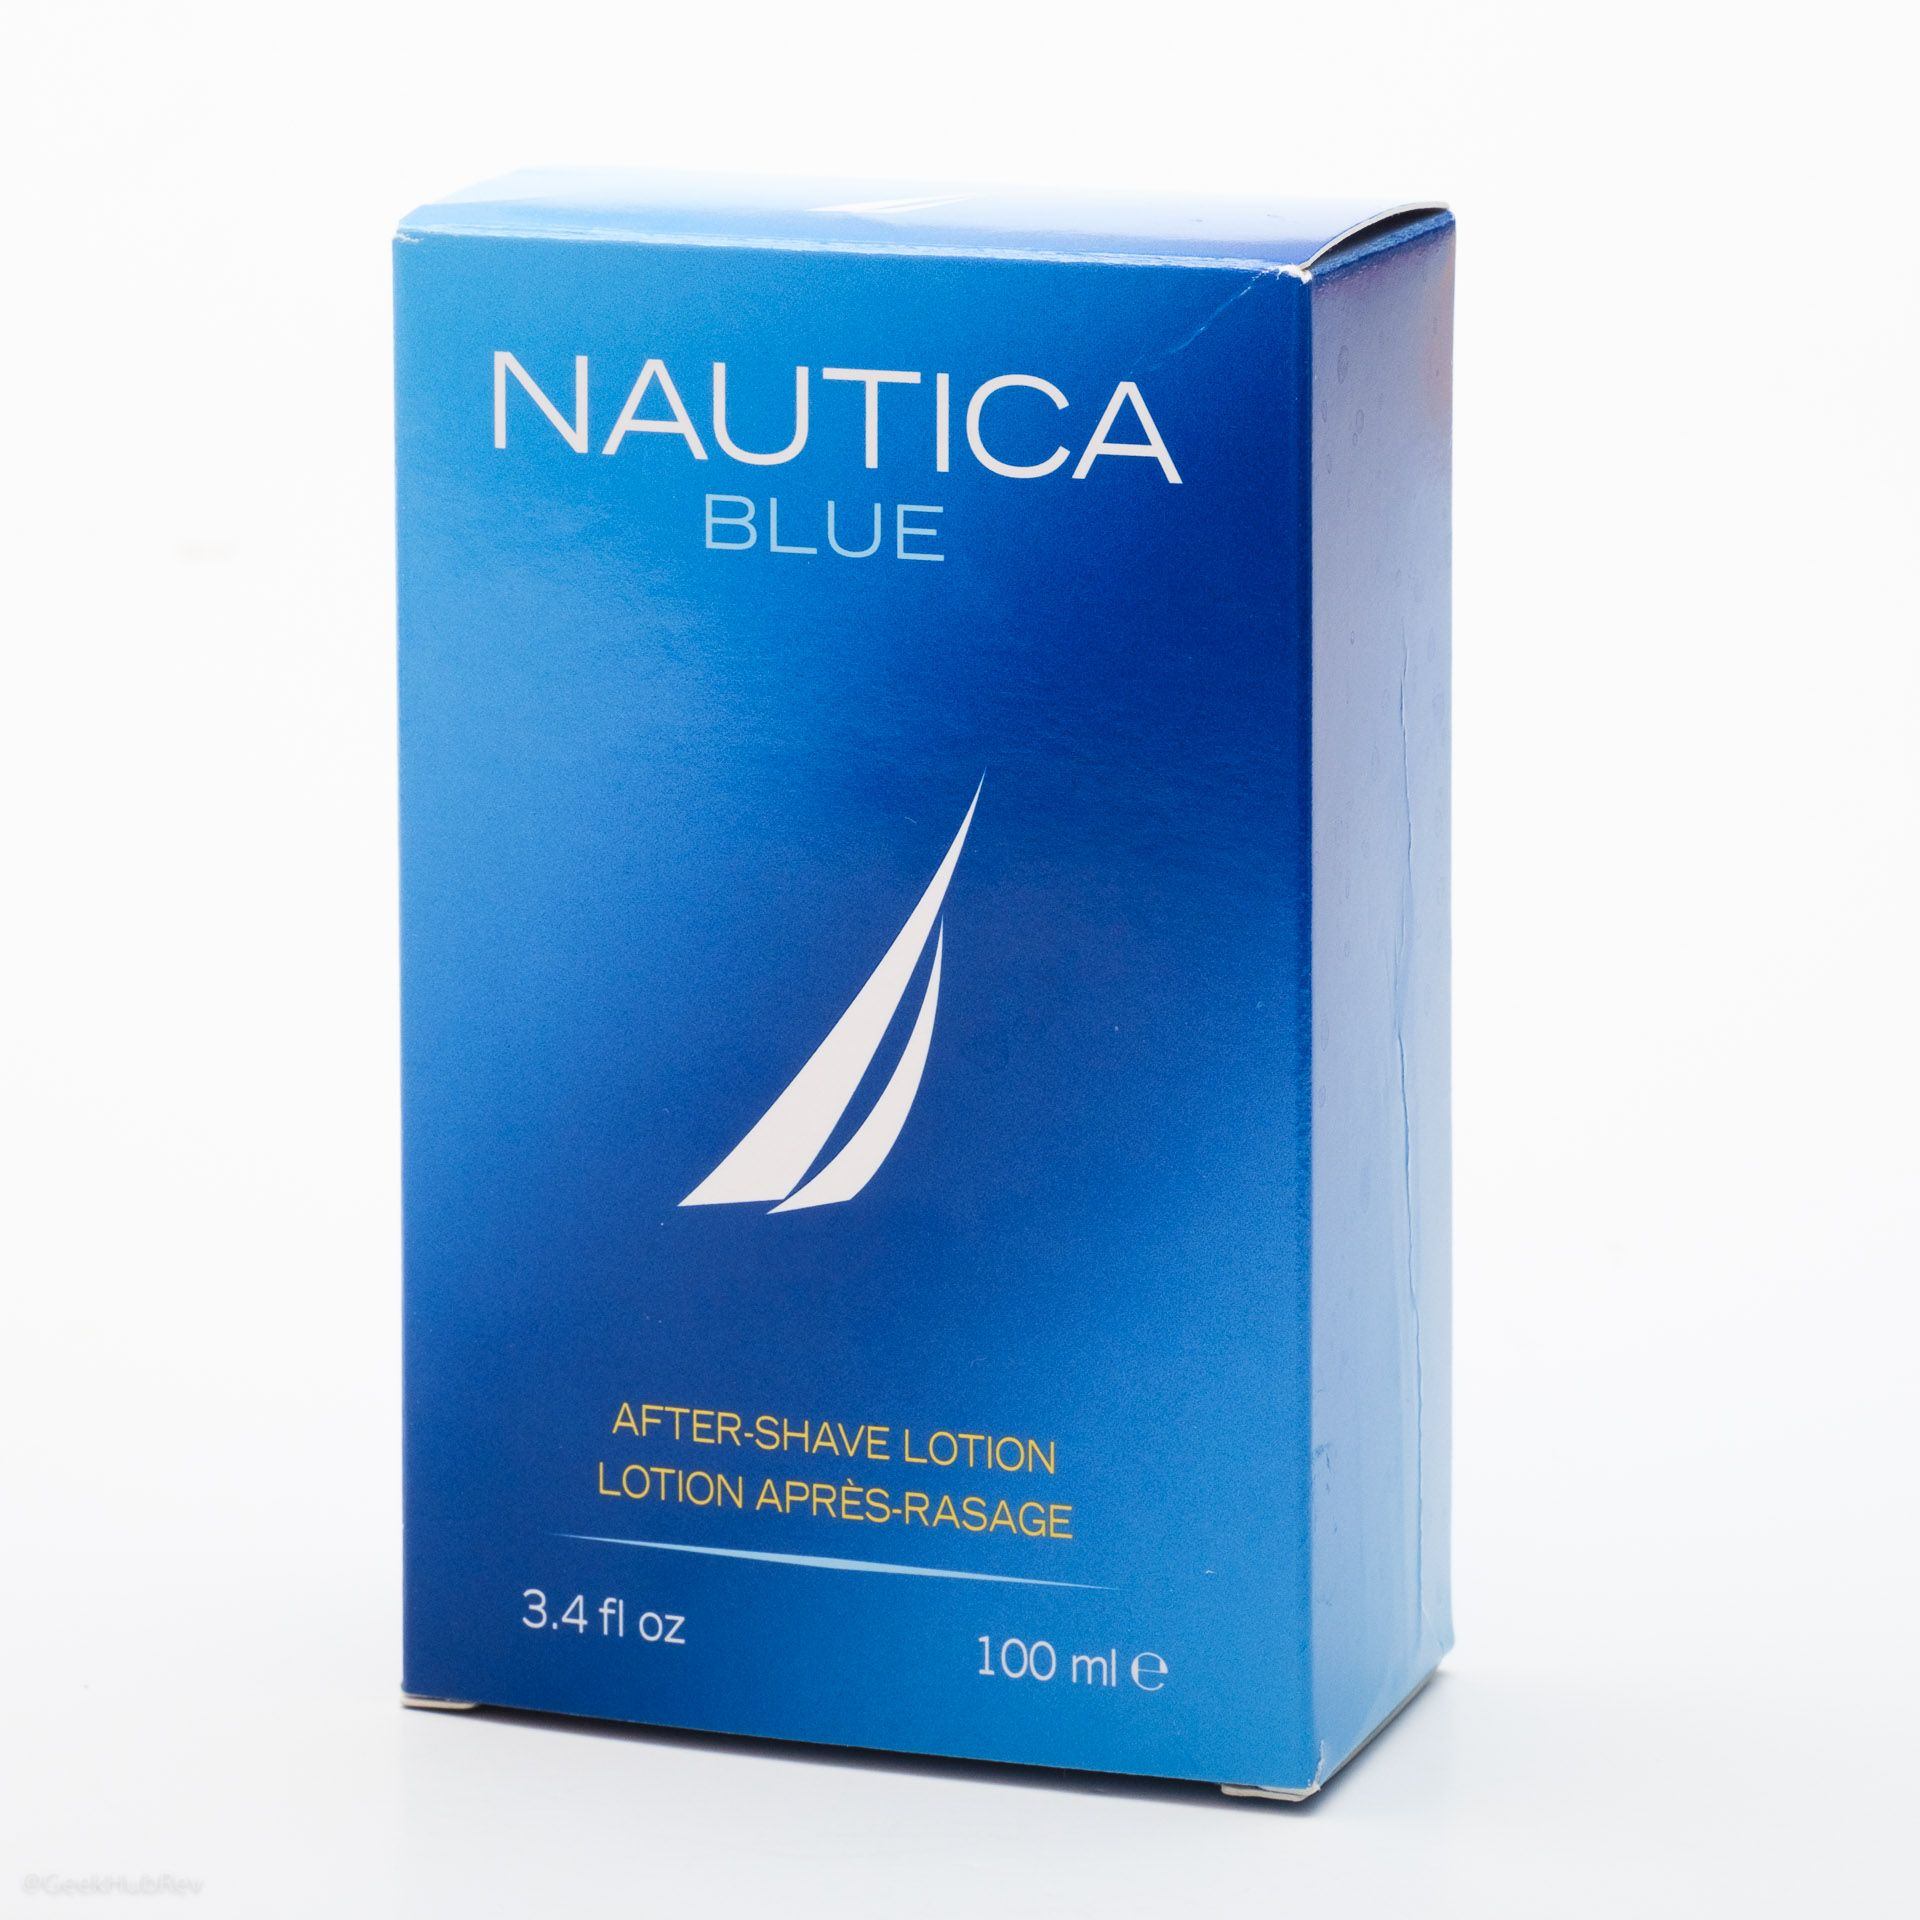 Opakowanie wody po goleniu Nautica Blue After Shave Lotion